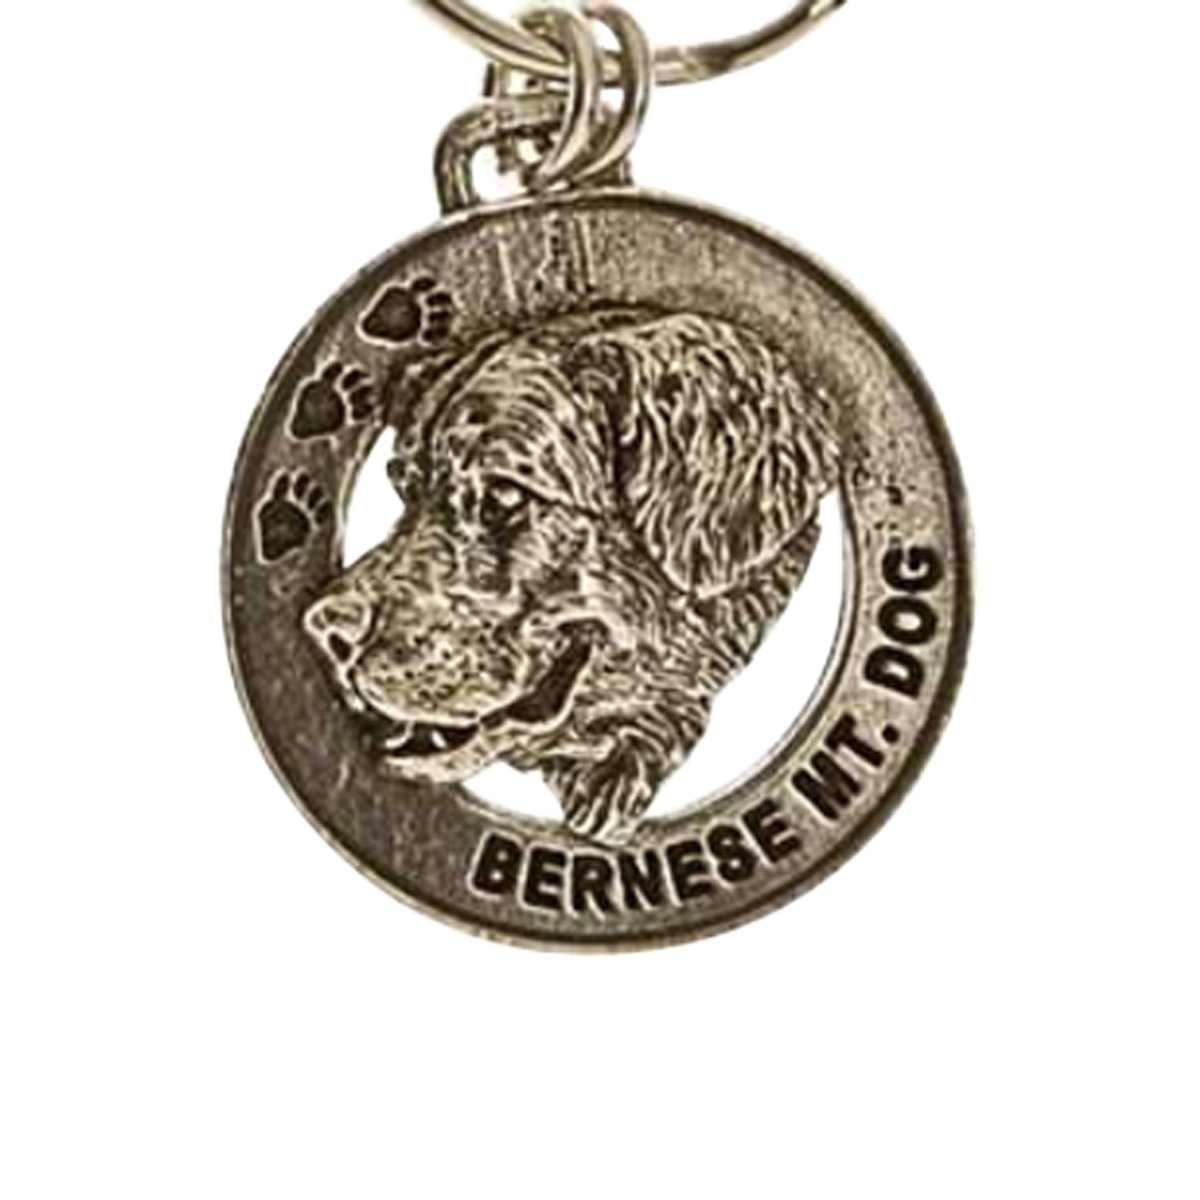 Creative Pewter Designs, Pewter Bernese Mountain Dog Key Chain, Antiqued Finish, DK024